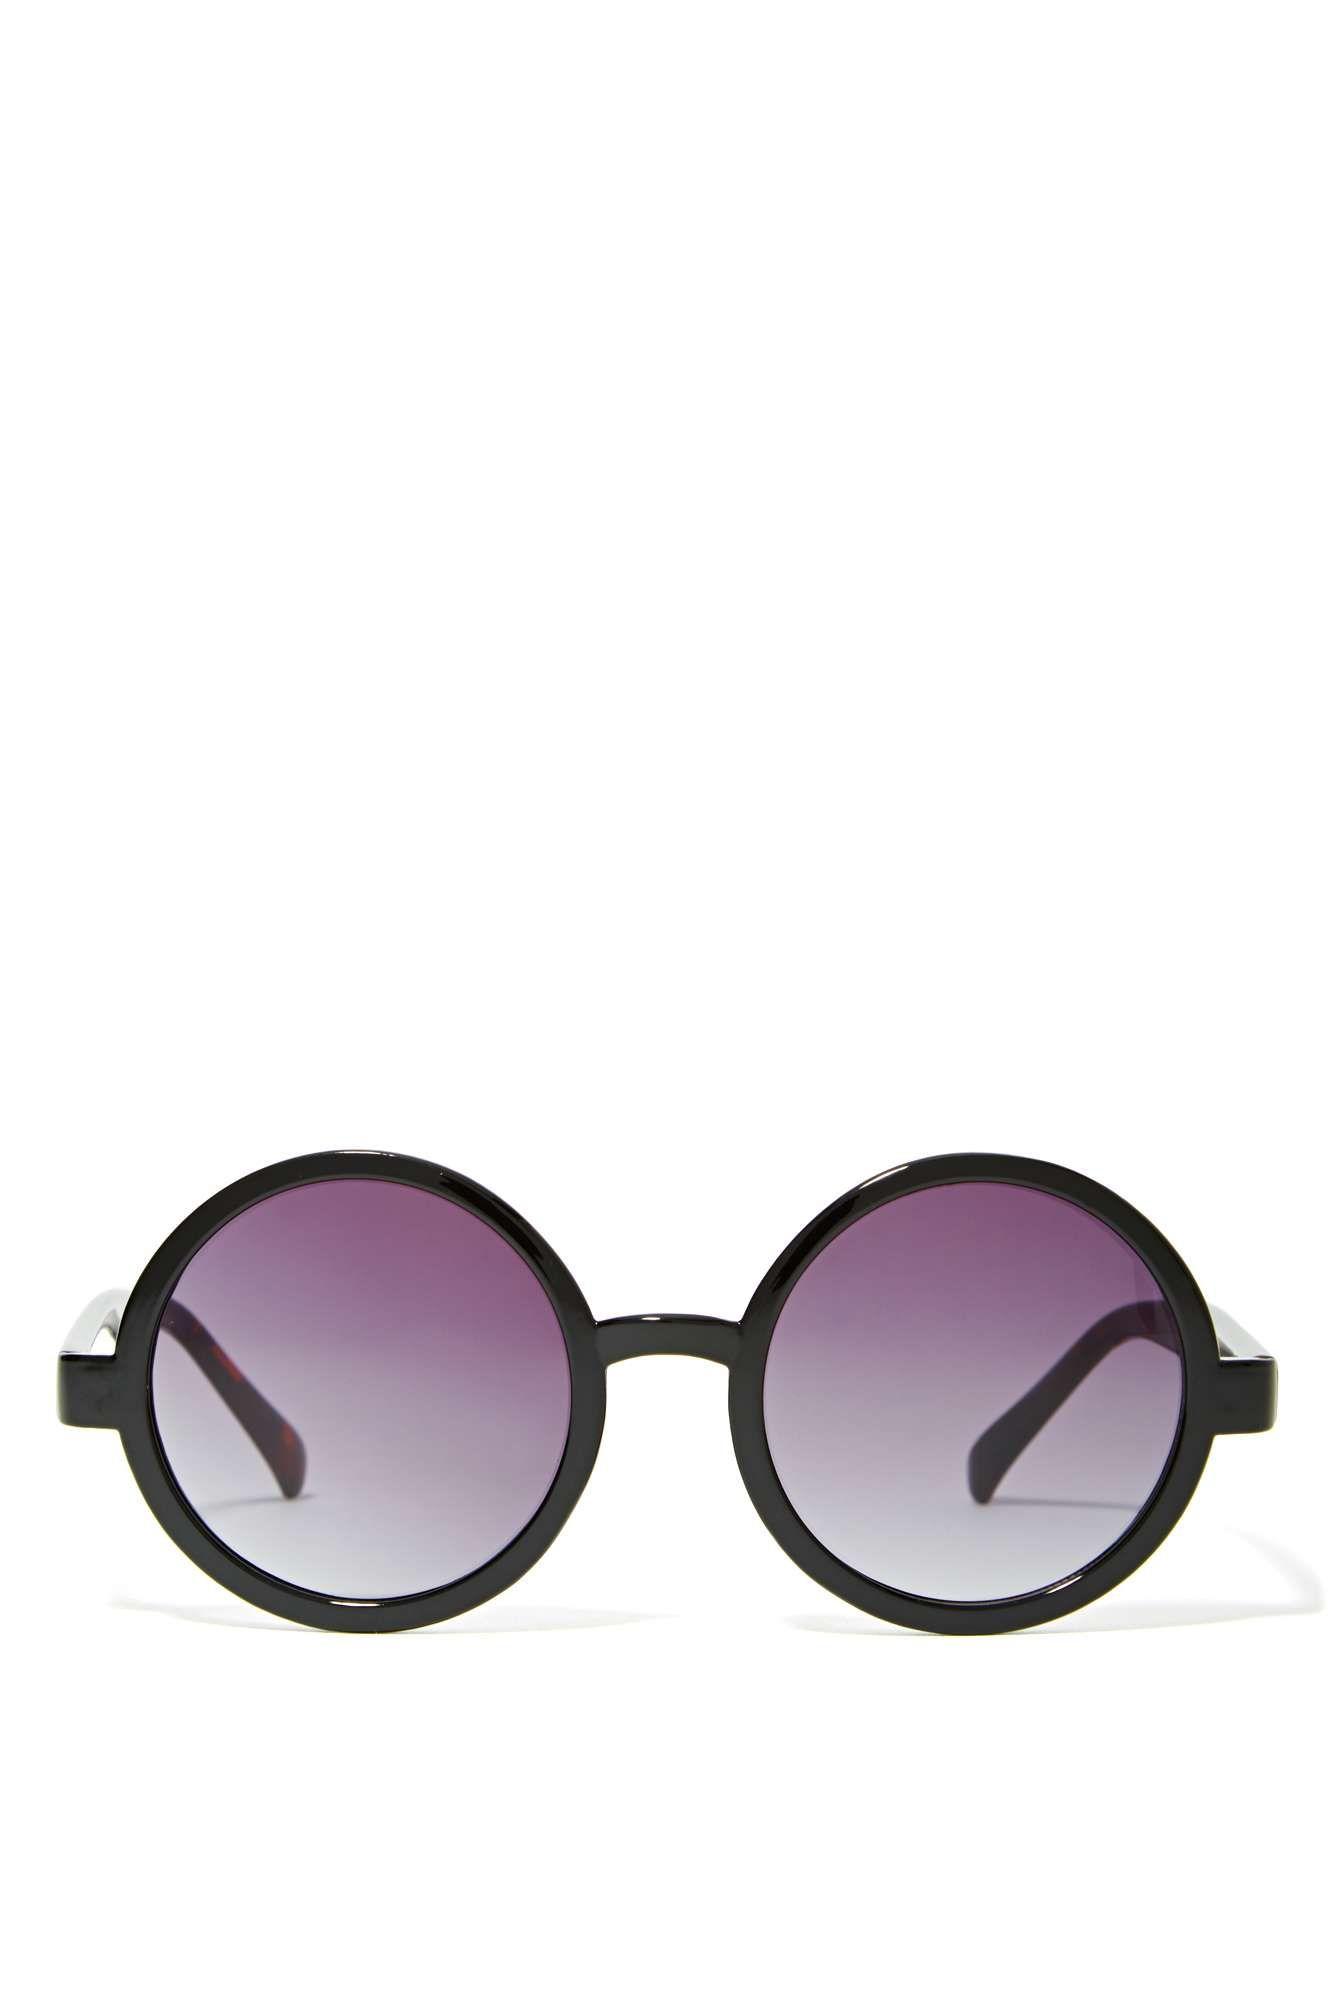 Run In Circles Shades   Glasses   Pinterest   Óculos e Acessórios 332e5ac455